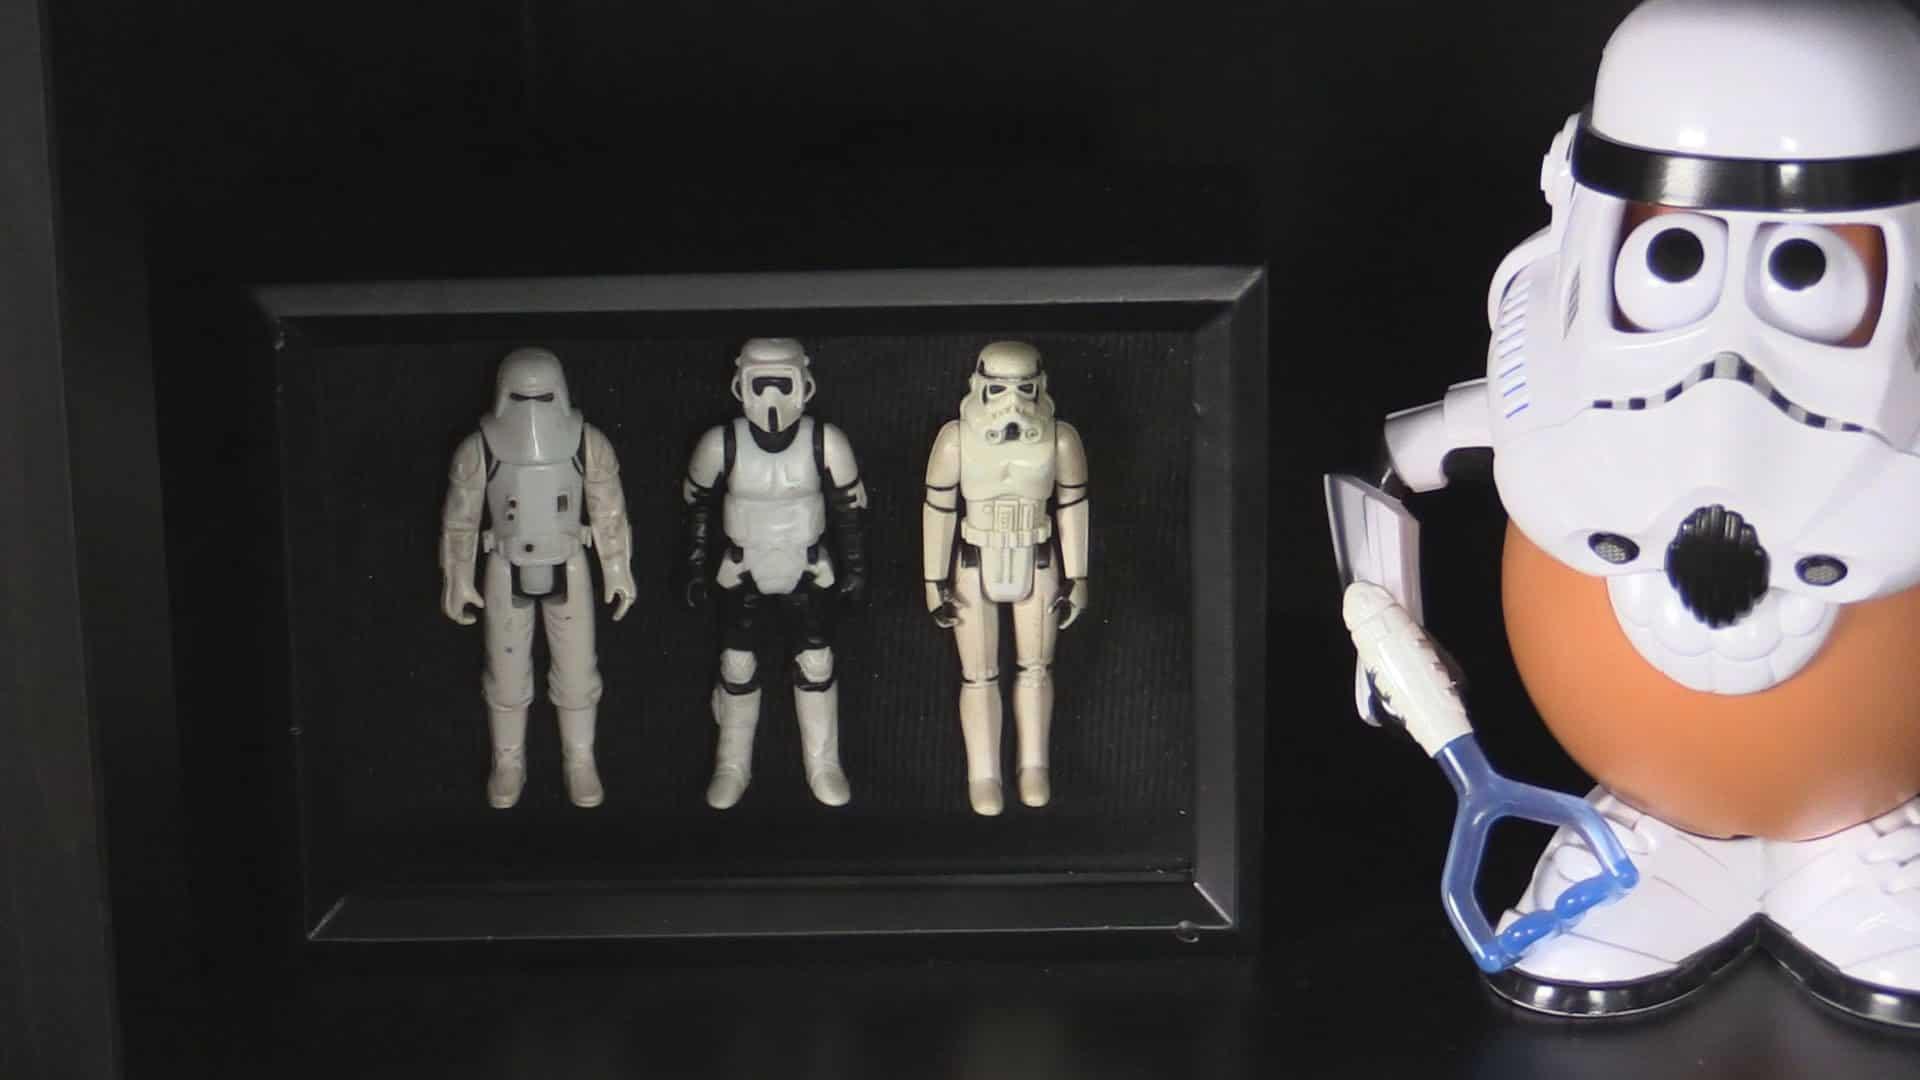 Star wars action figures shadow box display